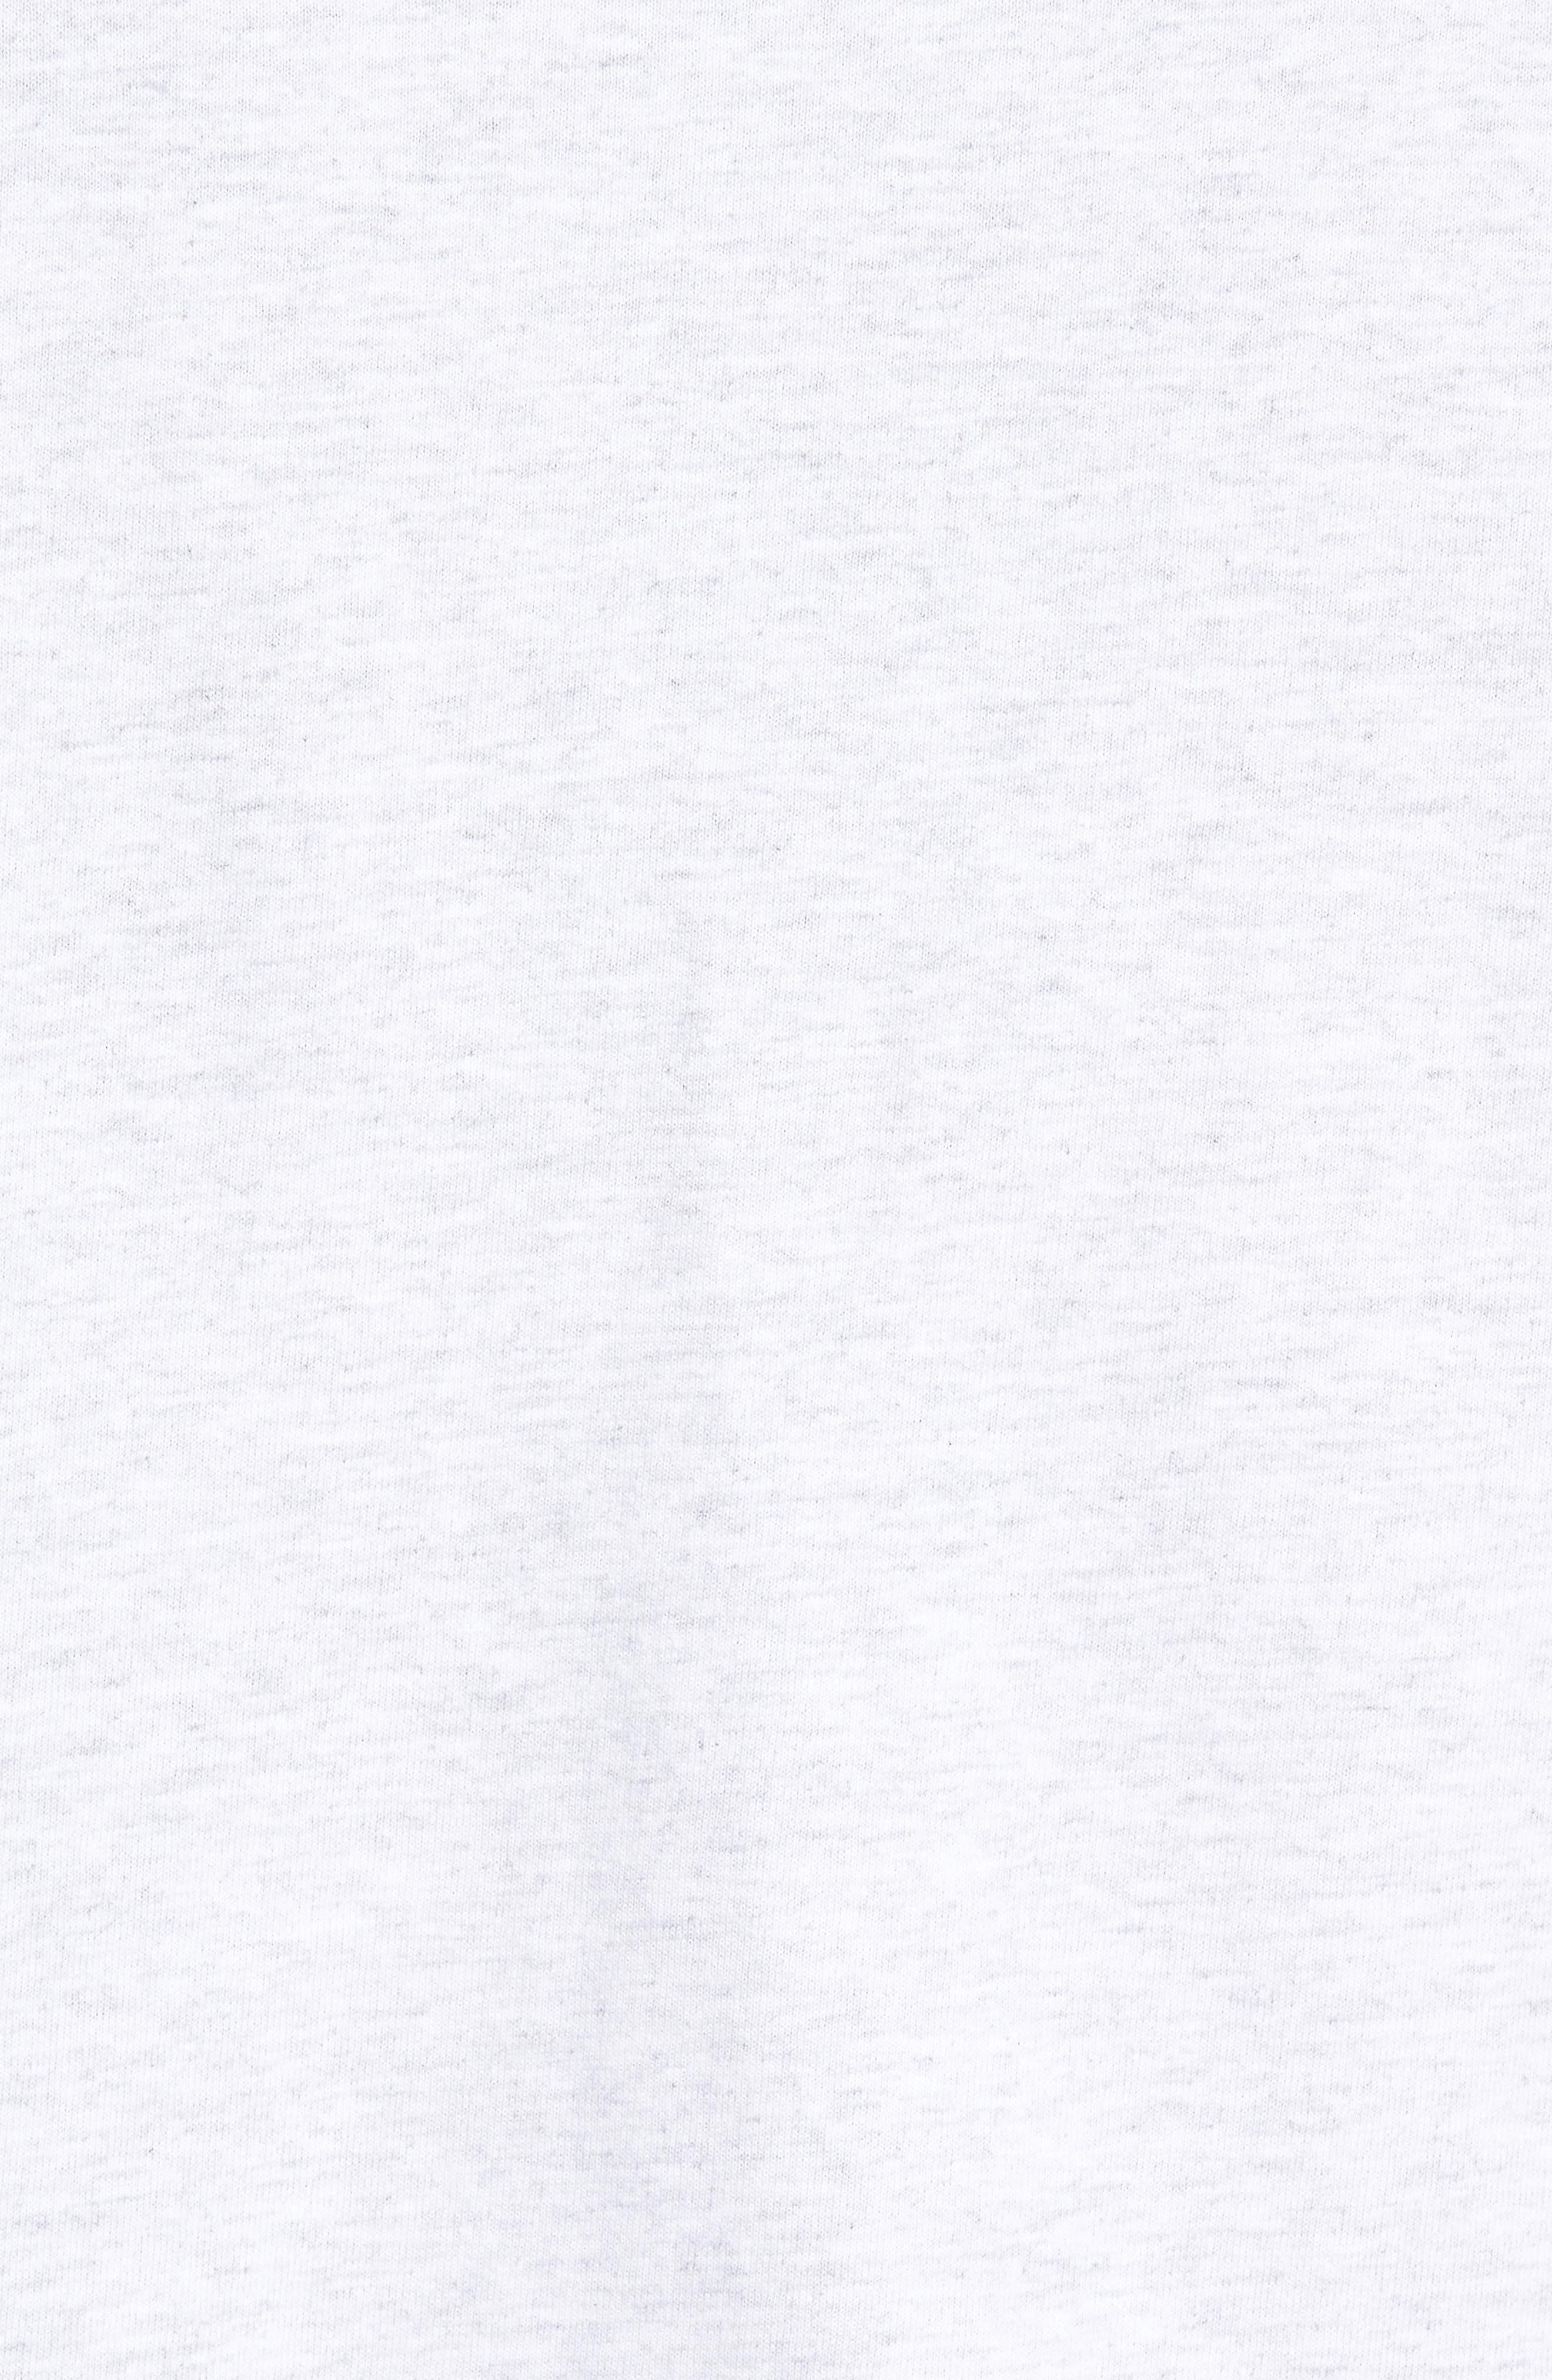 NIKBEN Egg T-Shirt,                             Alternate thumbnail 6, color,                             020